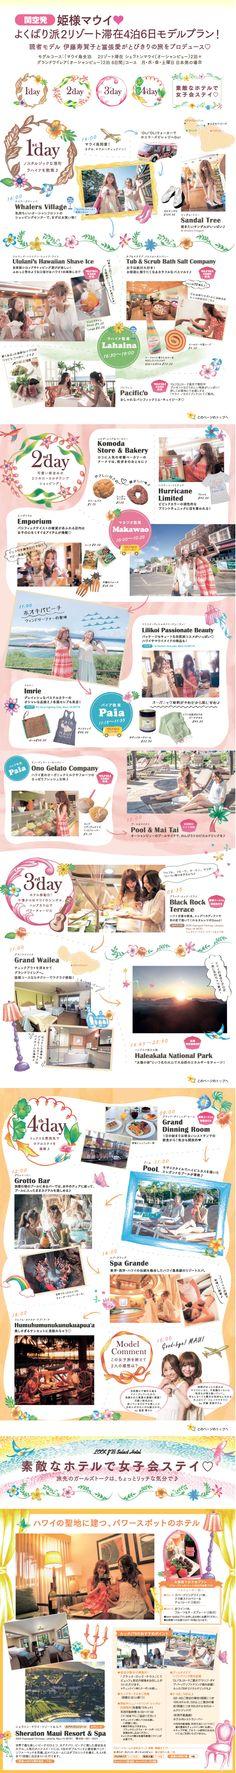 JTB特集ページ Website Layout, Web Layout, Layout Design, Best Web Design, Site Design, Editorial Layout, Editorial Design, Corporate Identity Design, Japan Design